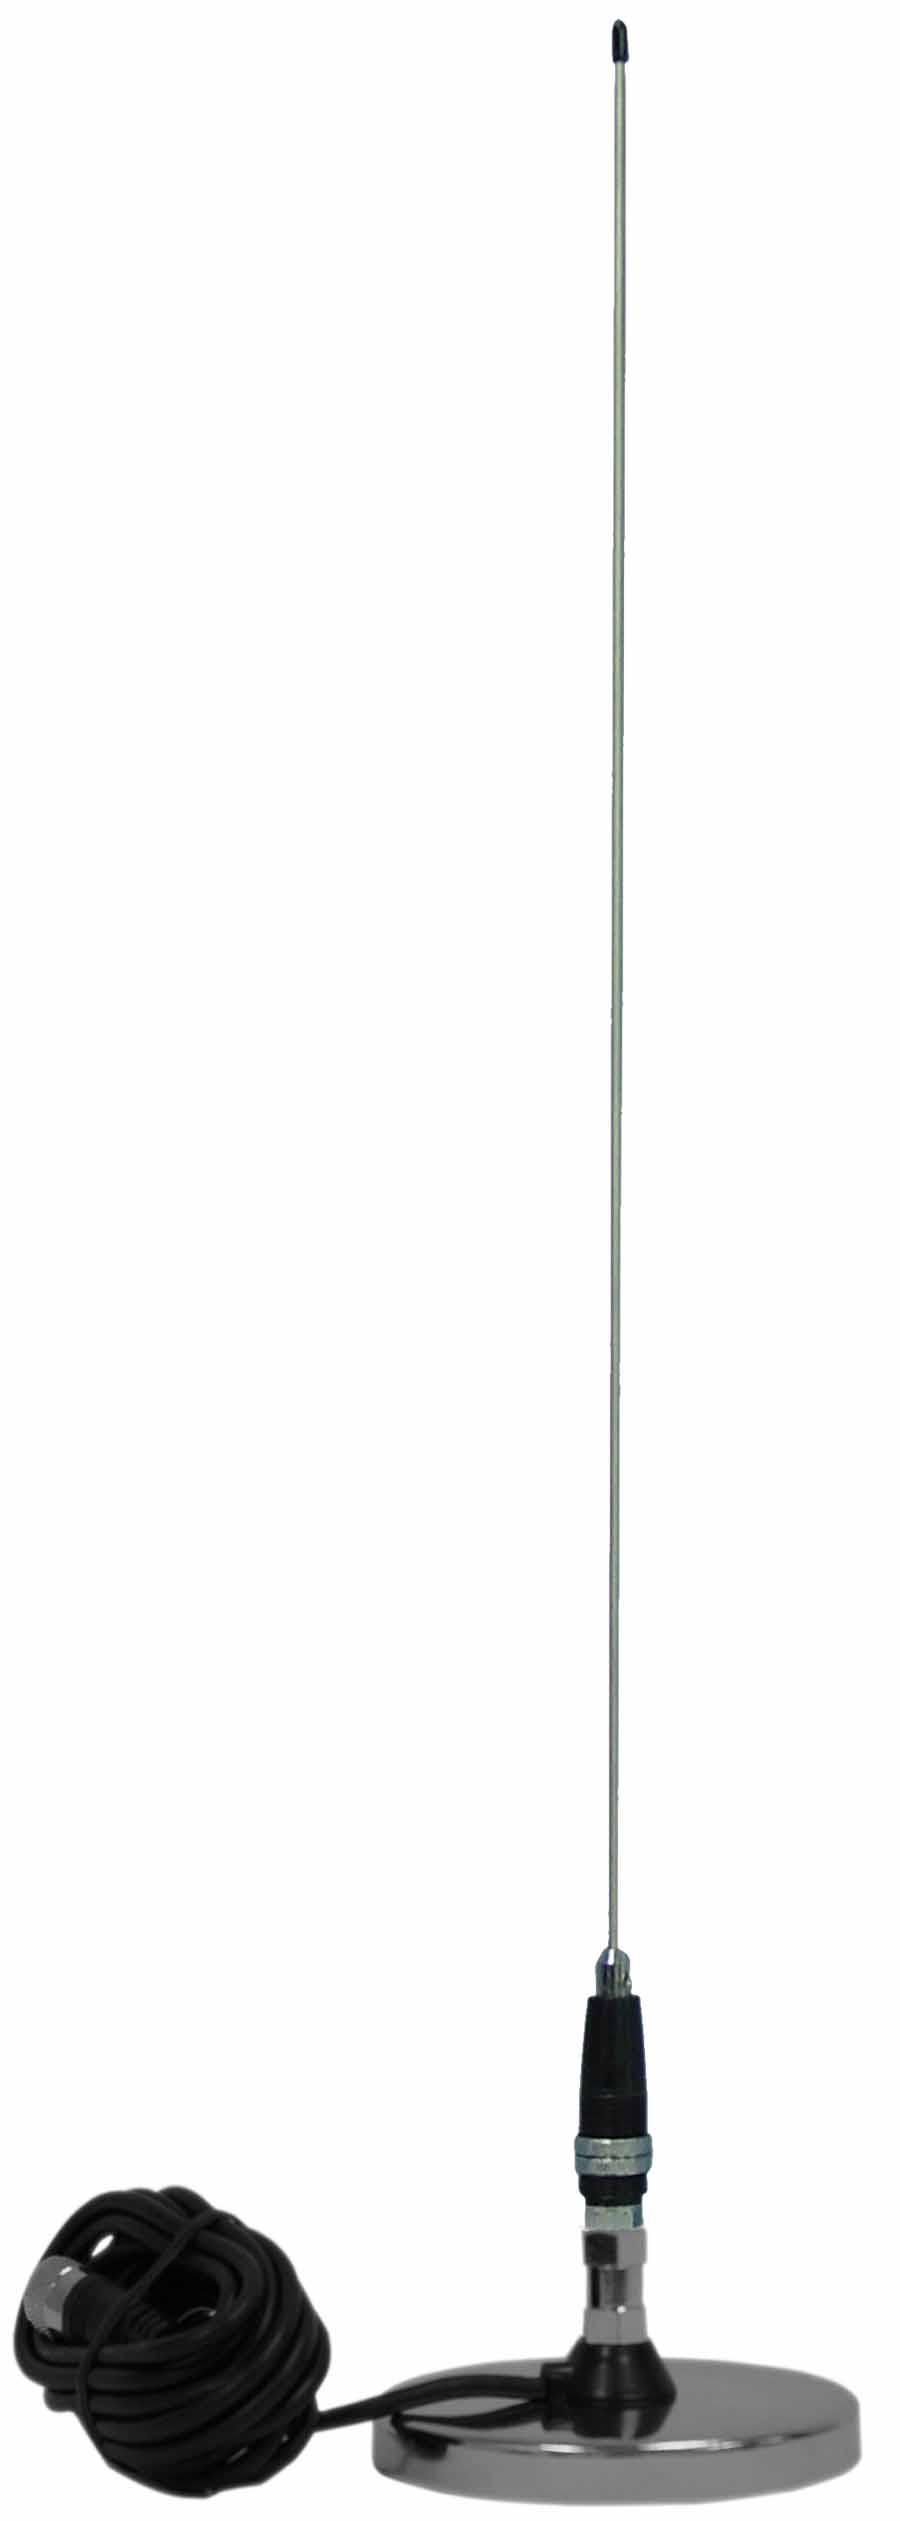 JBC112-4800 - ProComm 4' Kwik-Tune Magnet Mount CB Antenna Kit